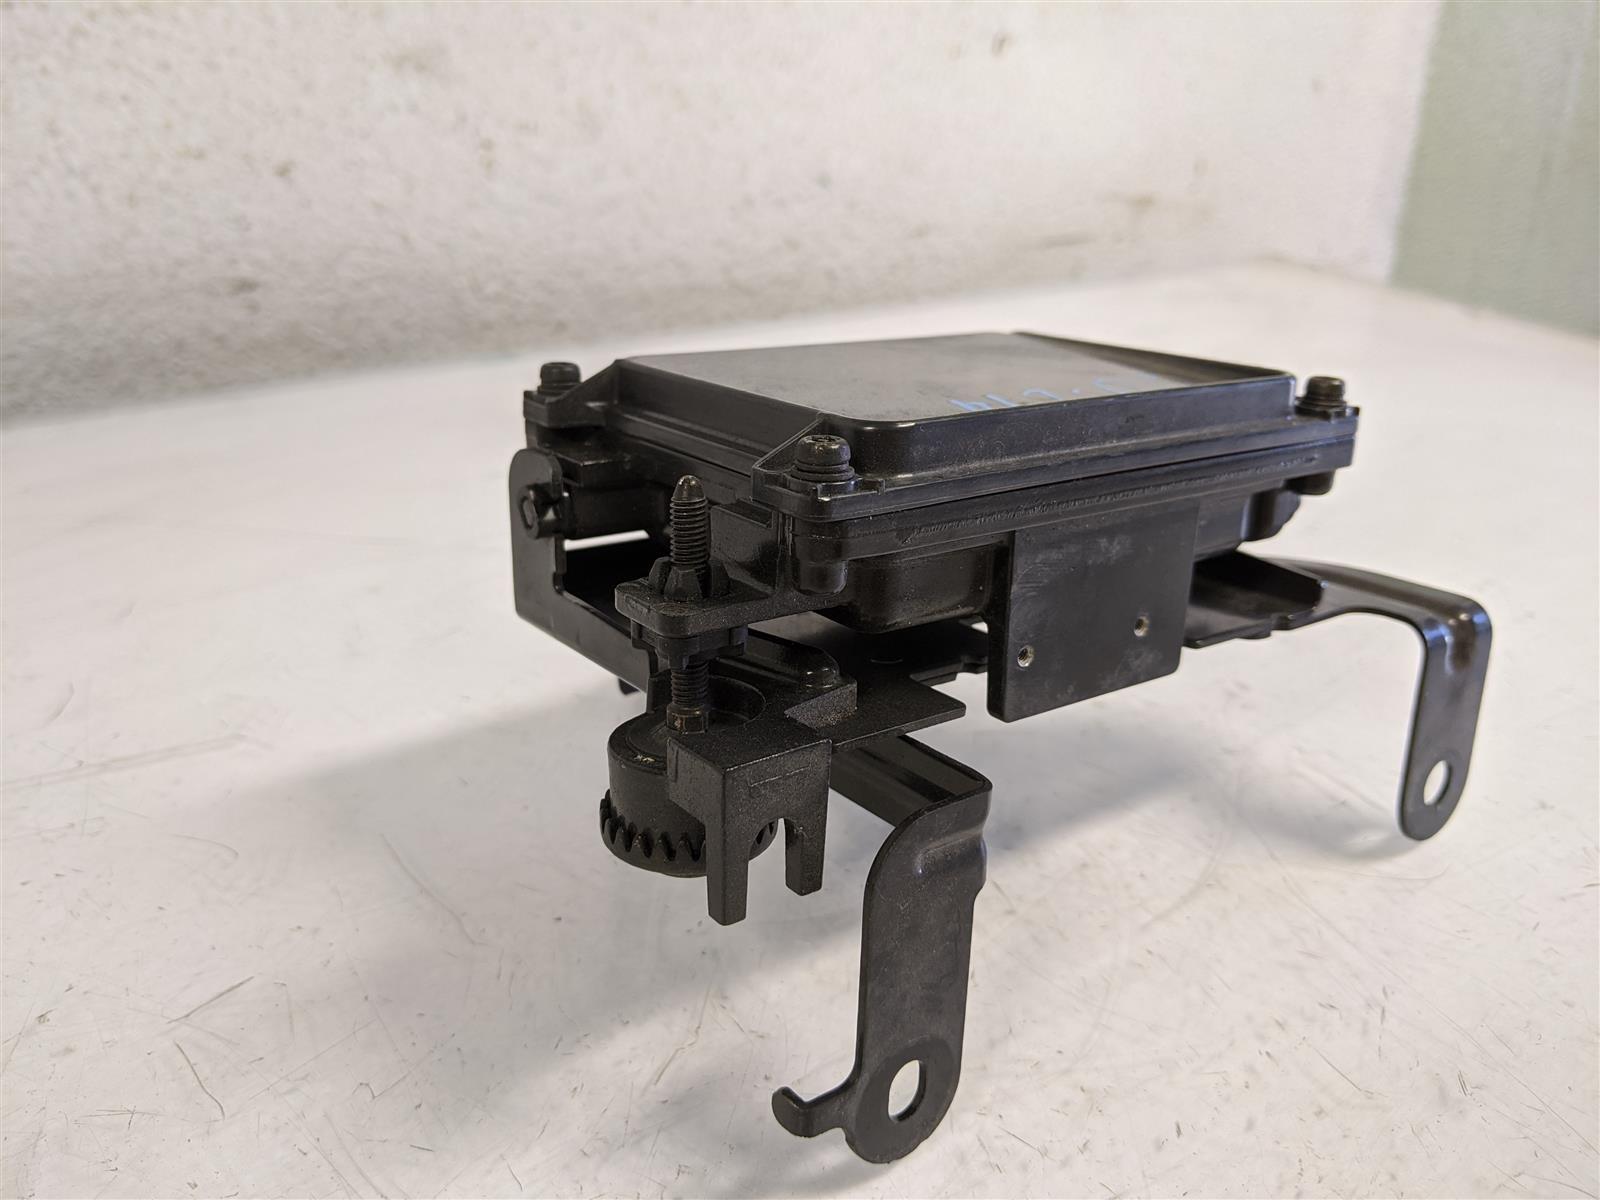 2018 Honda Odyssey Grille Radar Control Unit Replacement